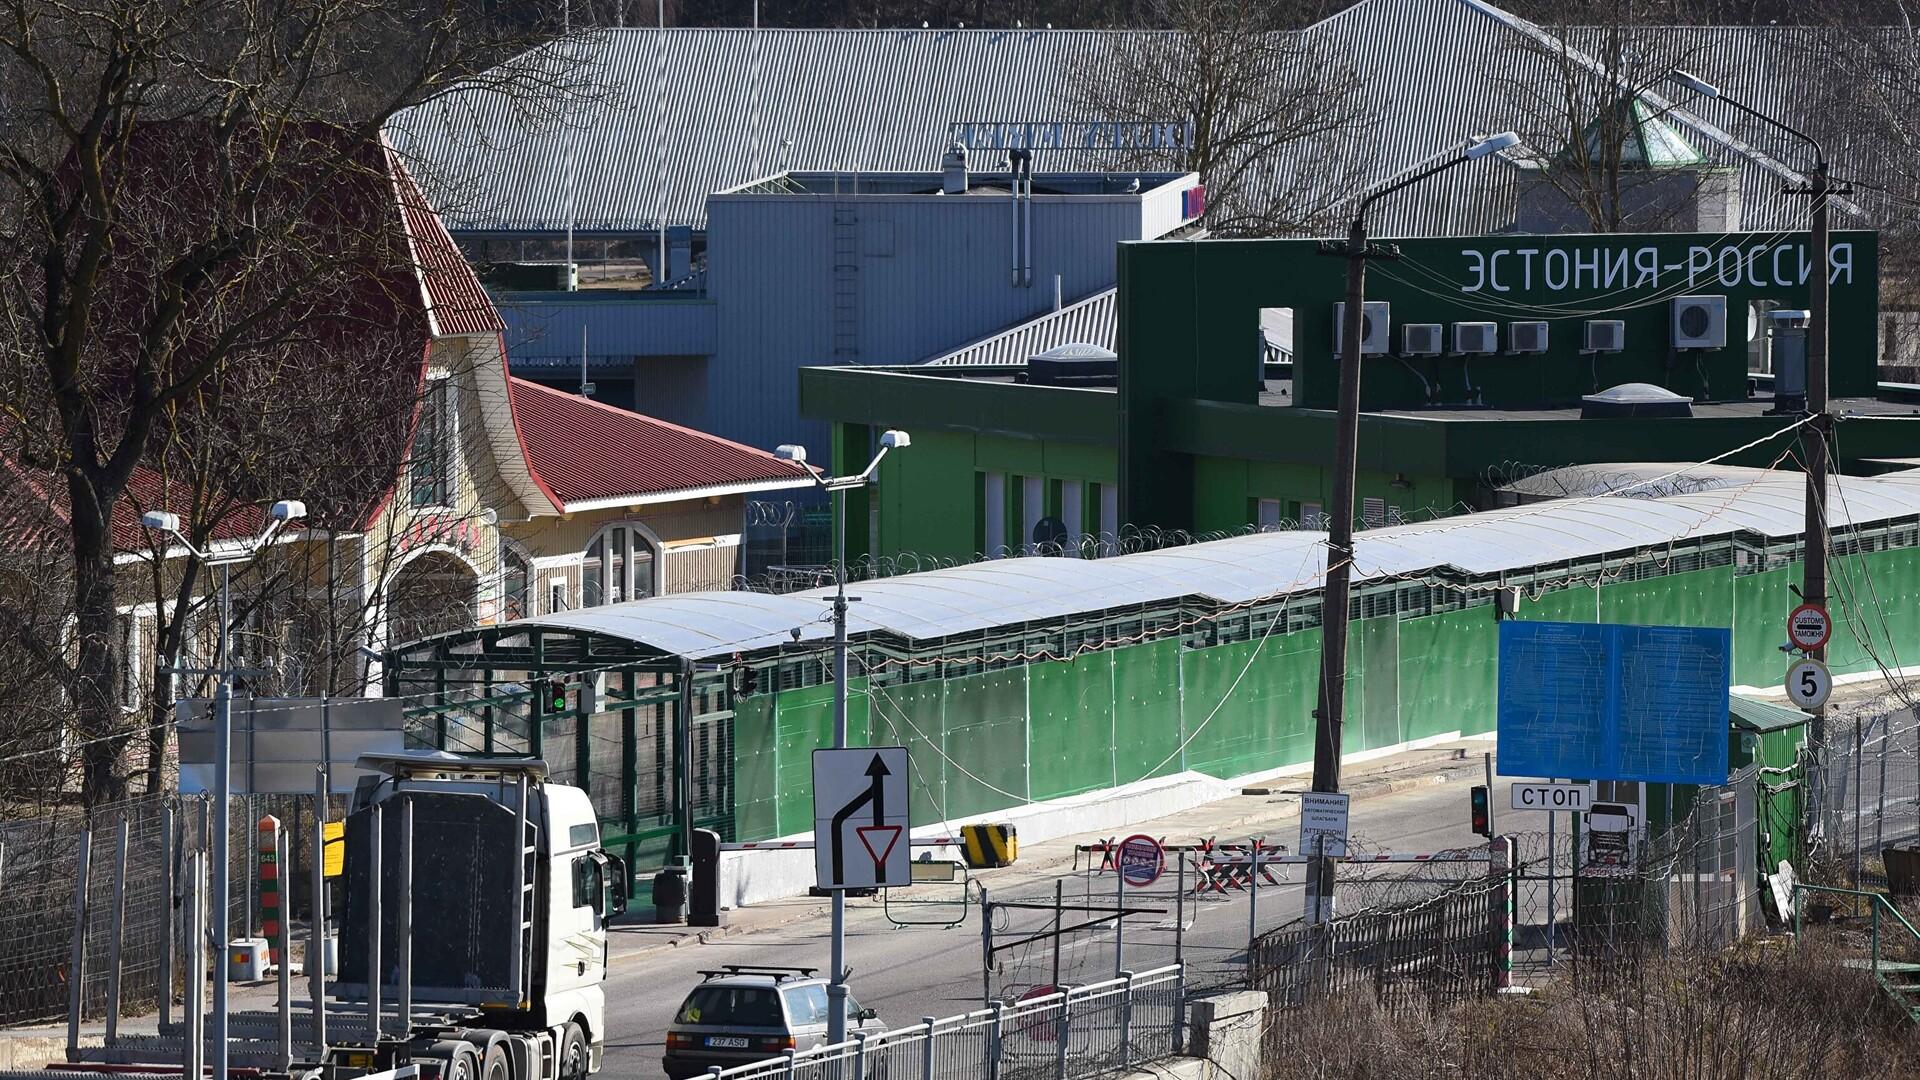 Открытие границ рф с эстонией новости о недвижимости в дубае